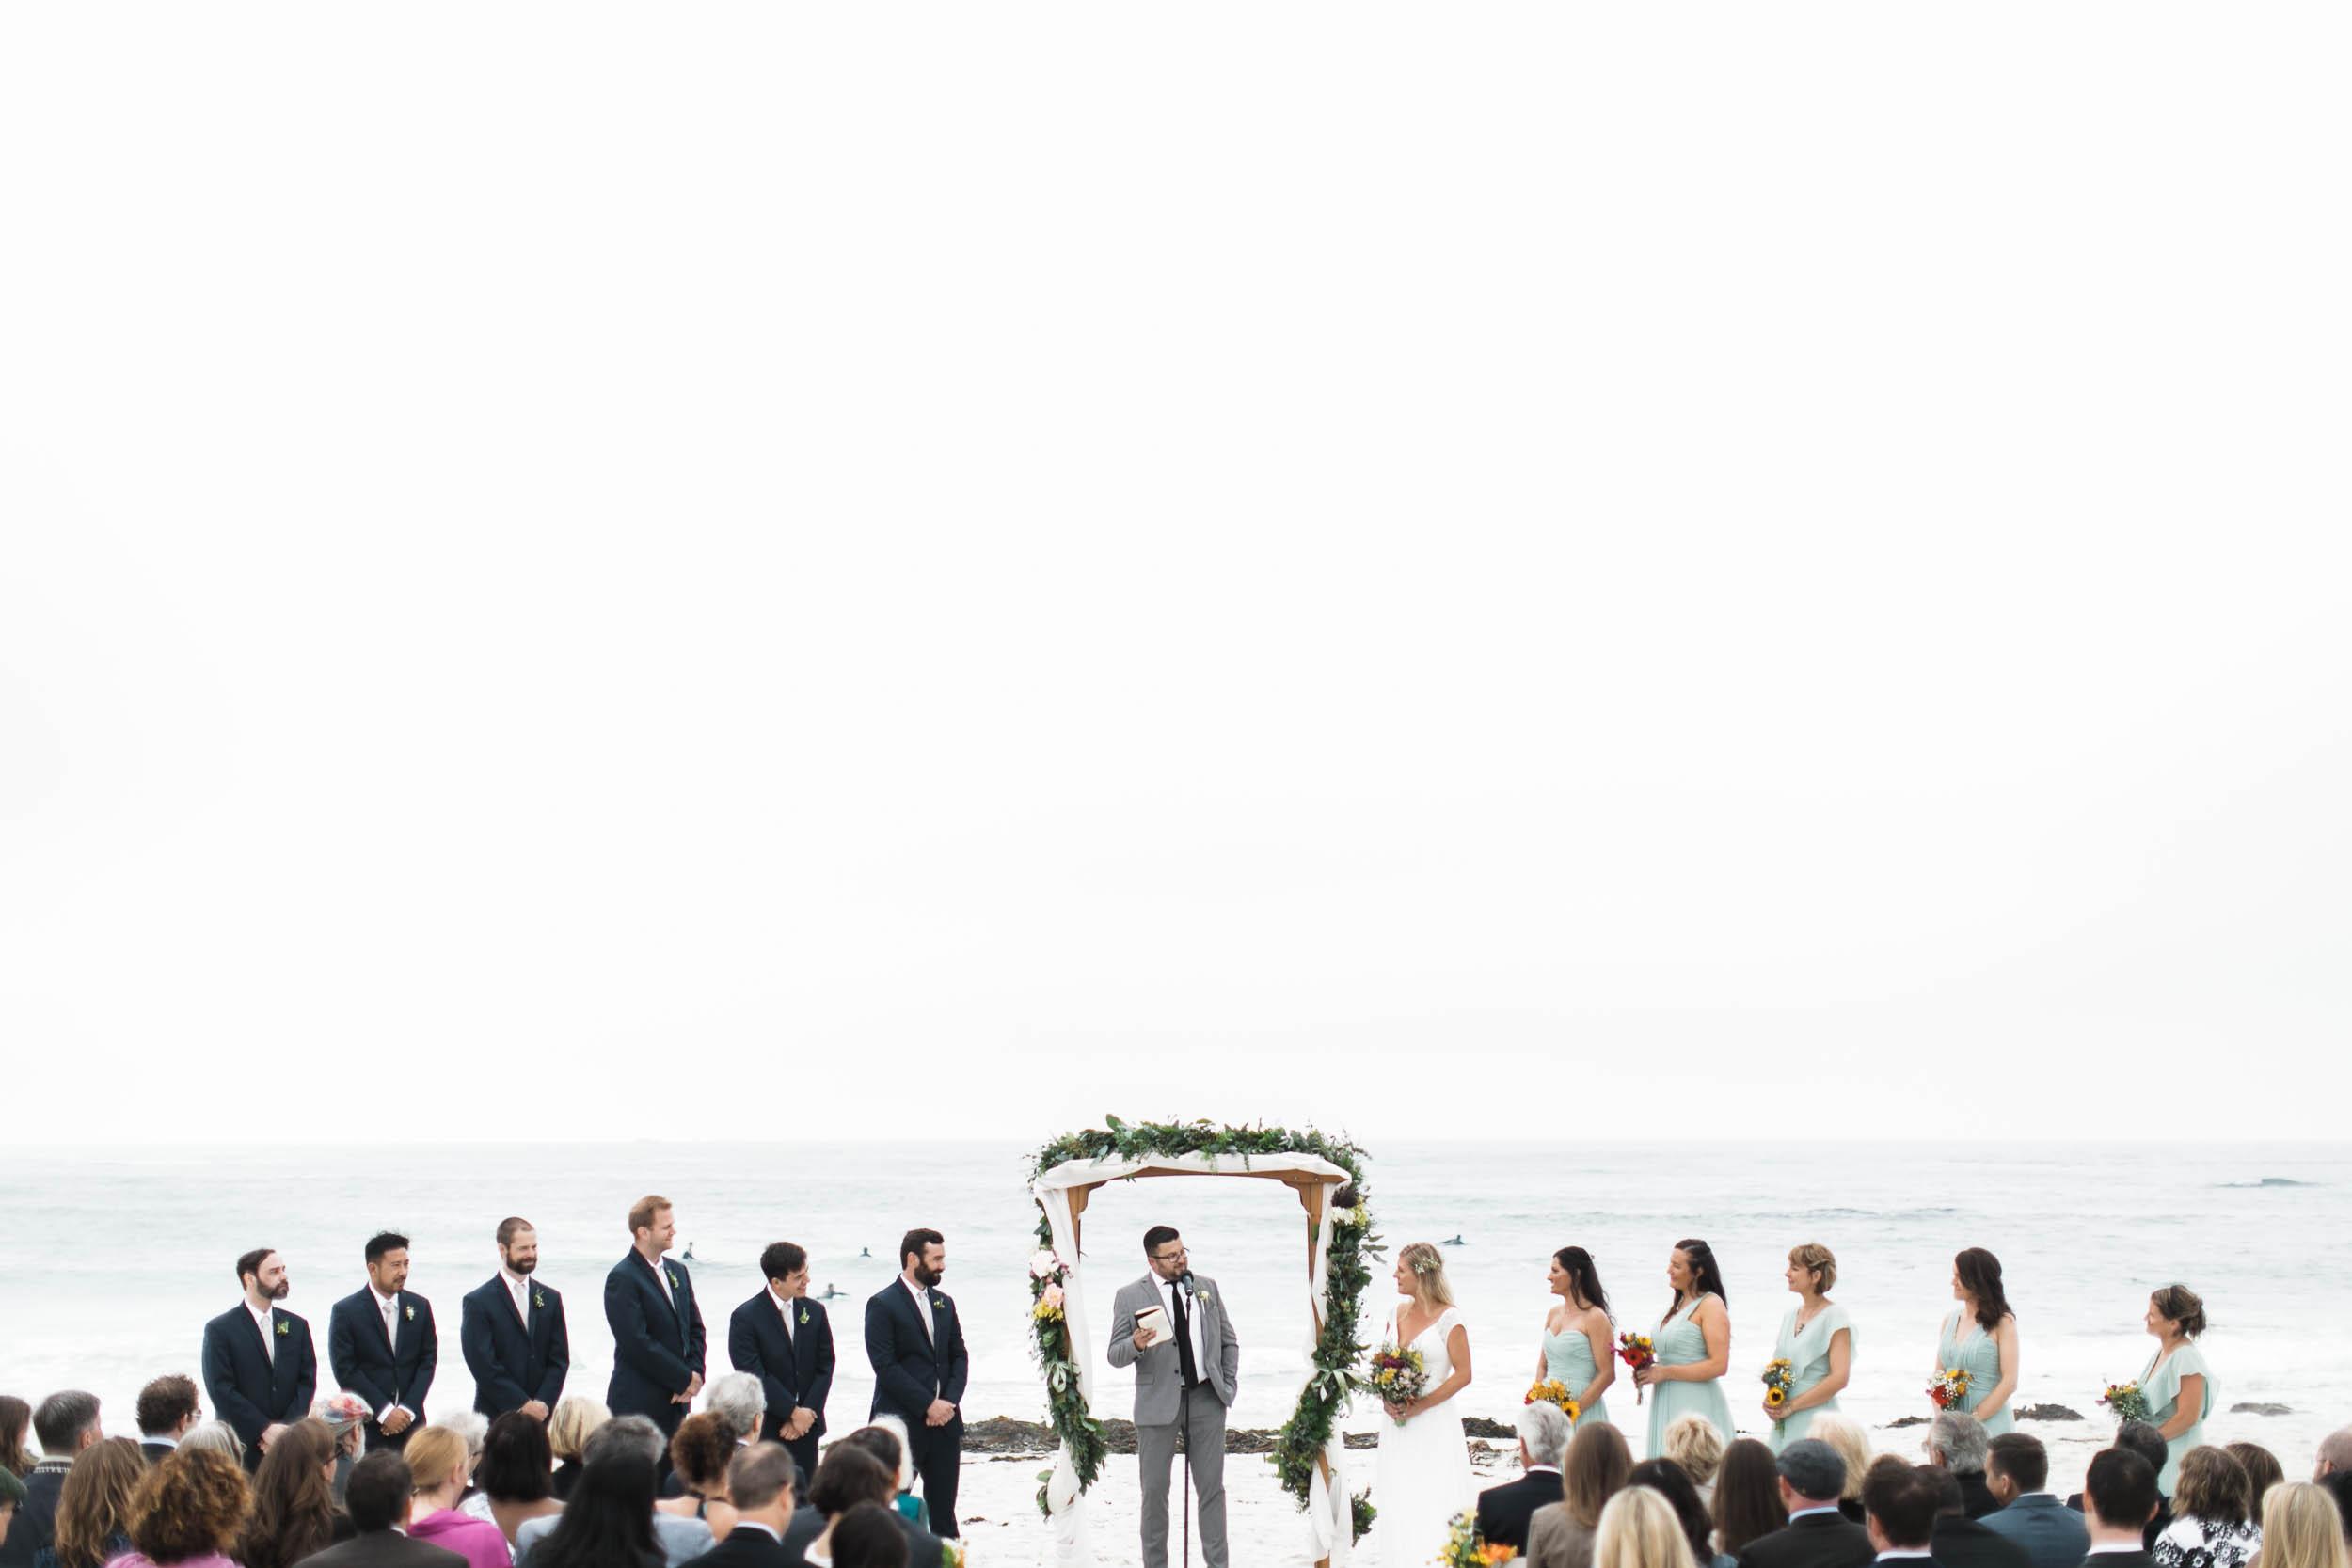 082617_C+K_Asilomar Pacific Grove Wedding_Buena Lane Photography_2457ER.jpg